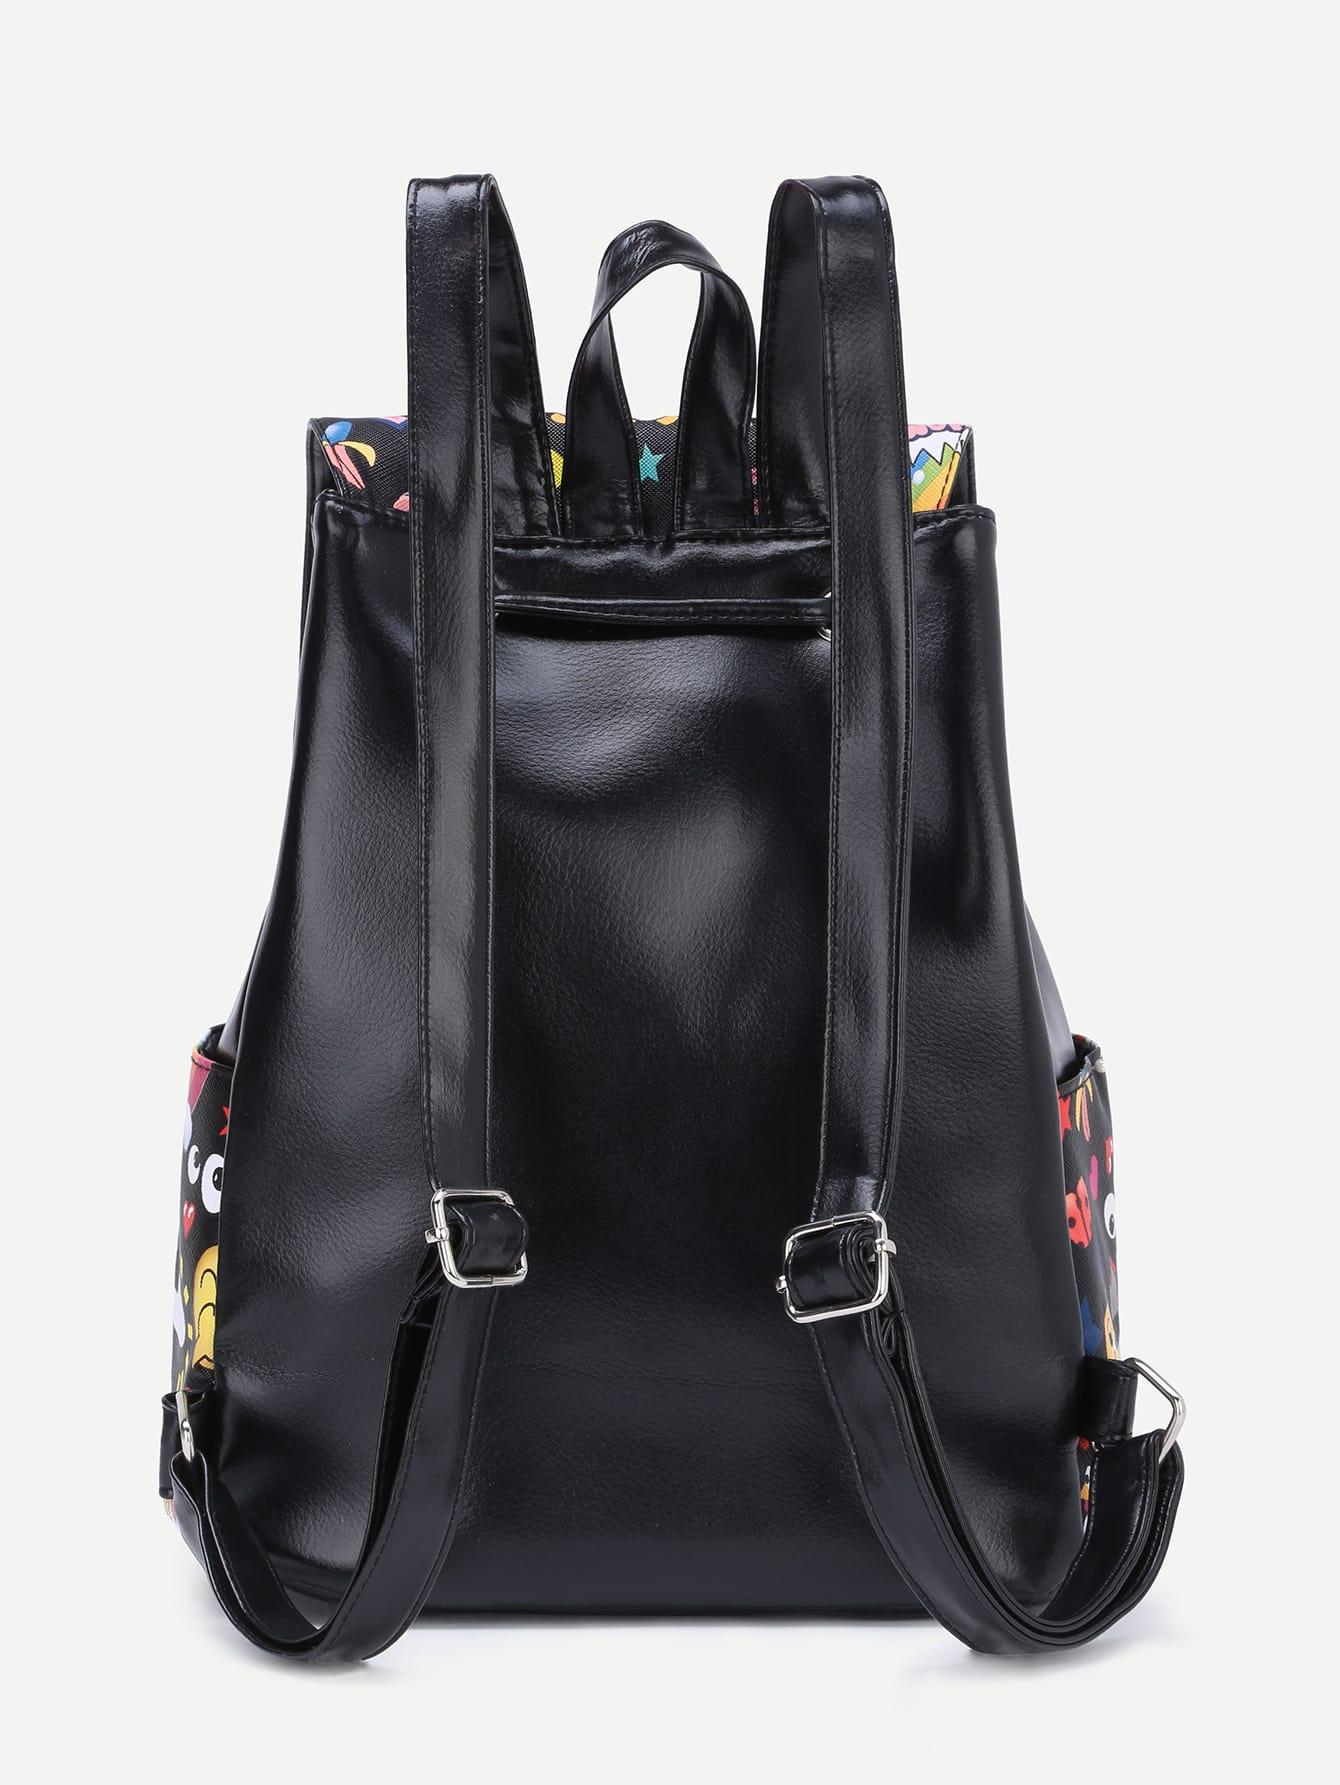 bag160819919_2